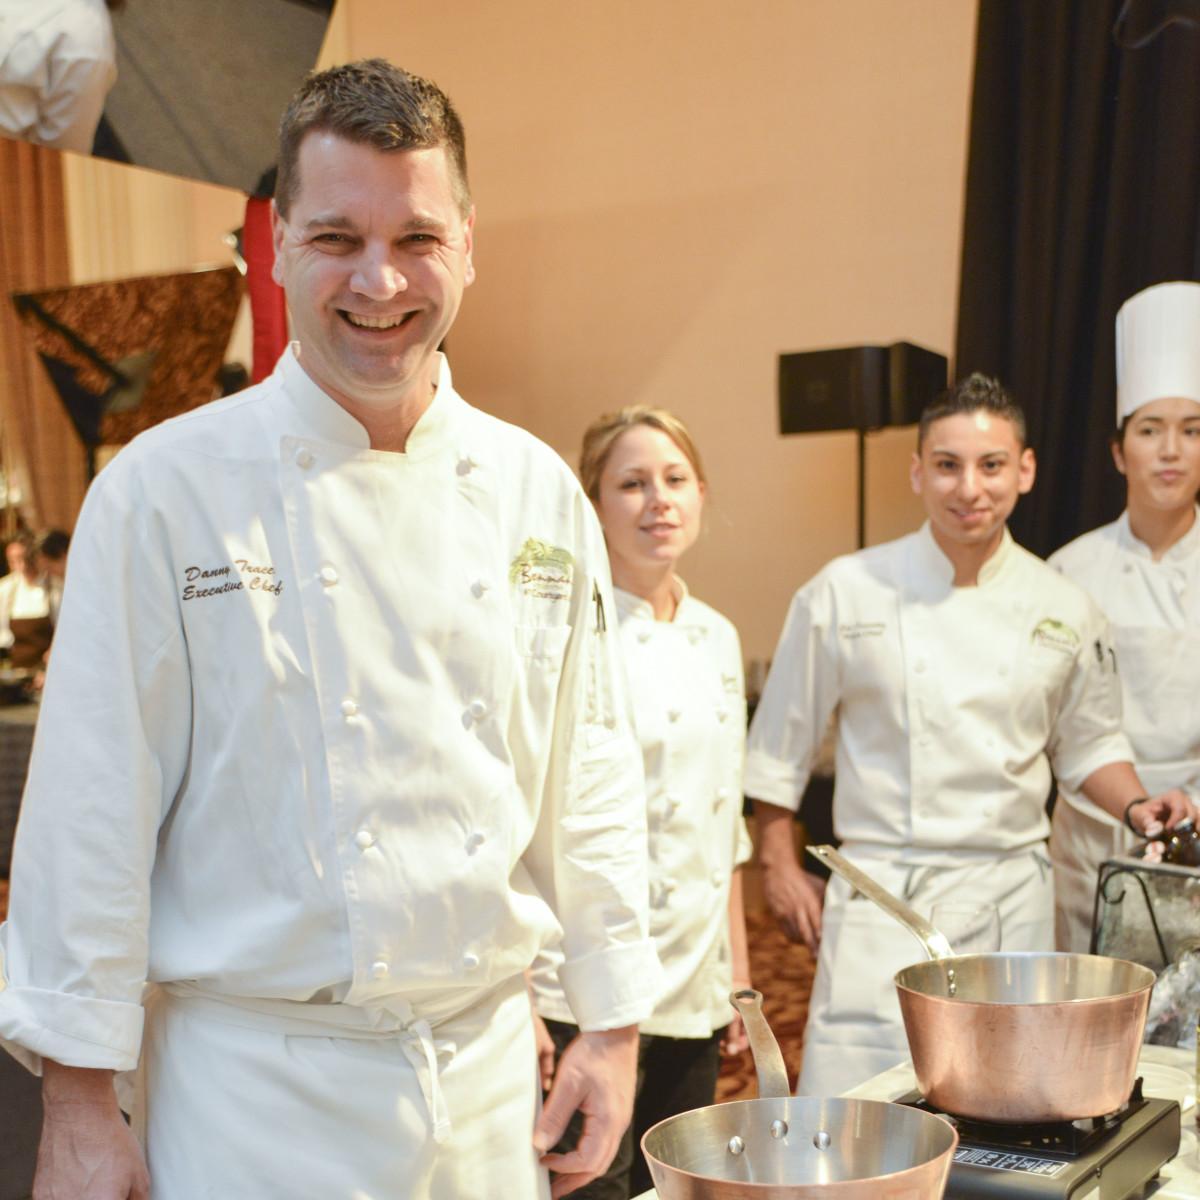 012, Bon Vivant Houston culinary event, January 2013, Danny Trace (Brennan's)